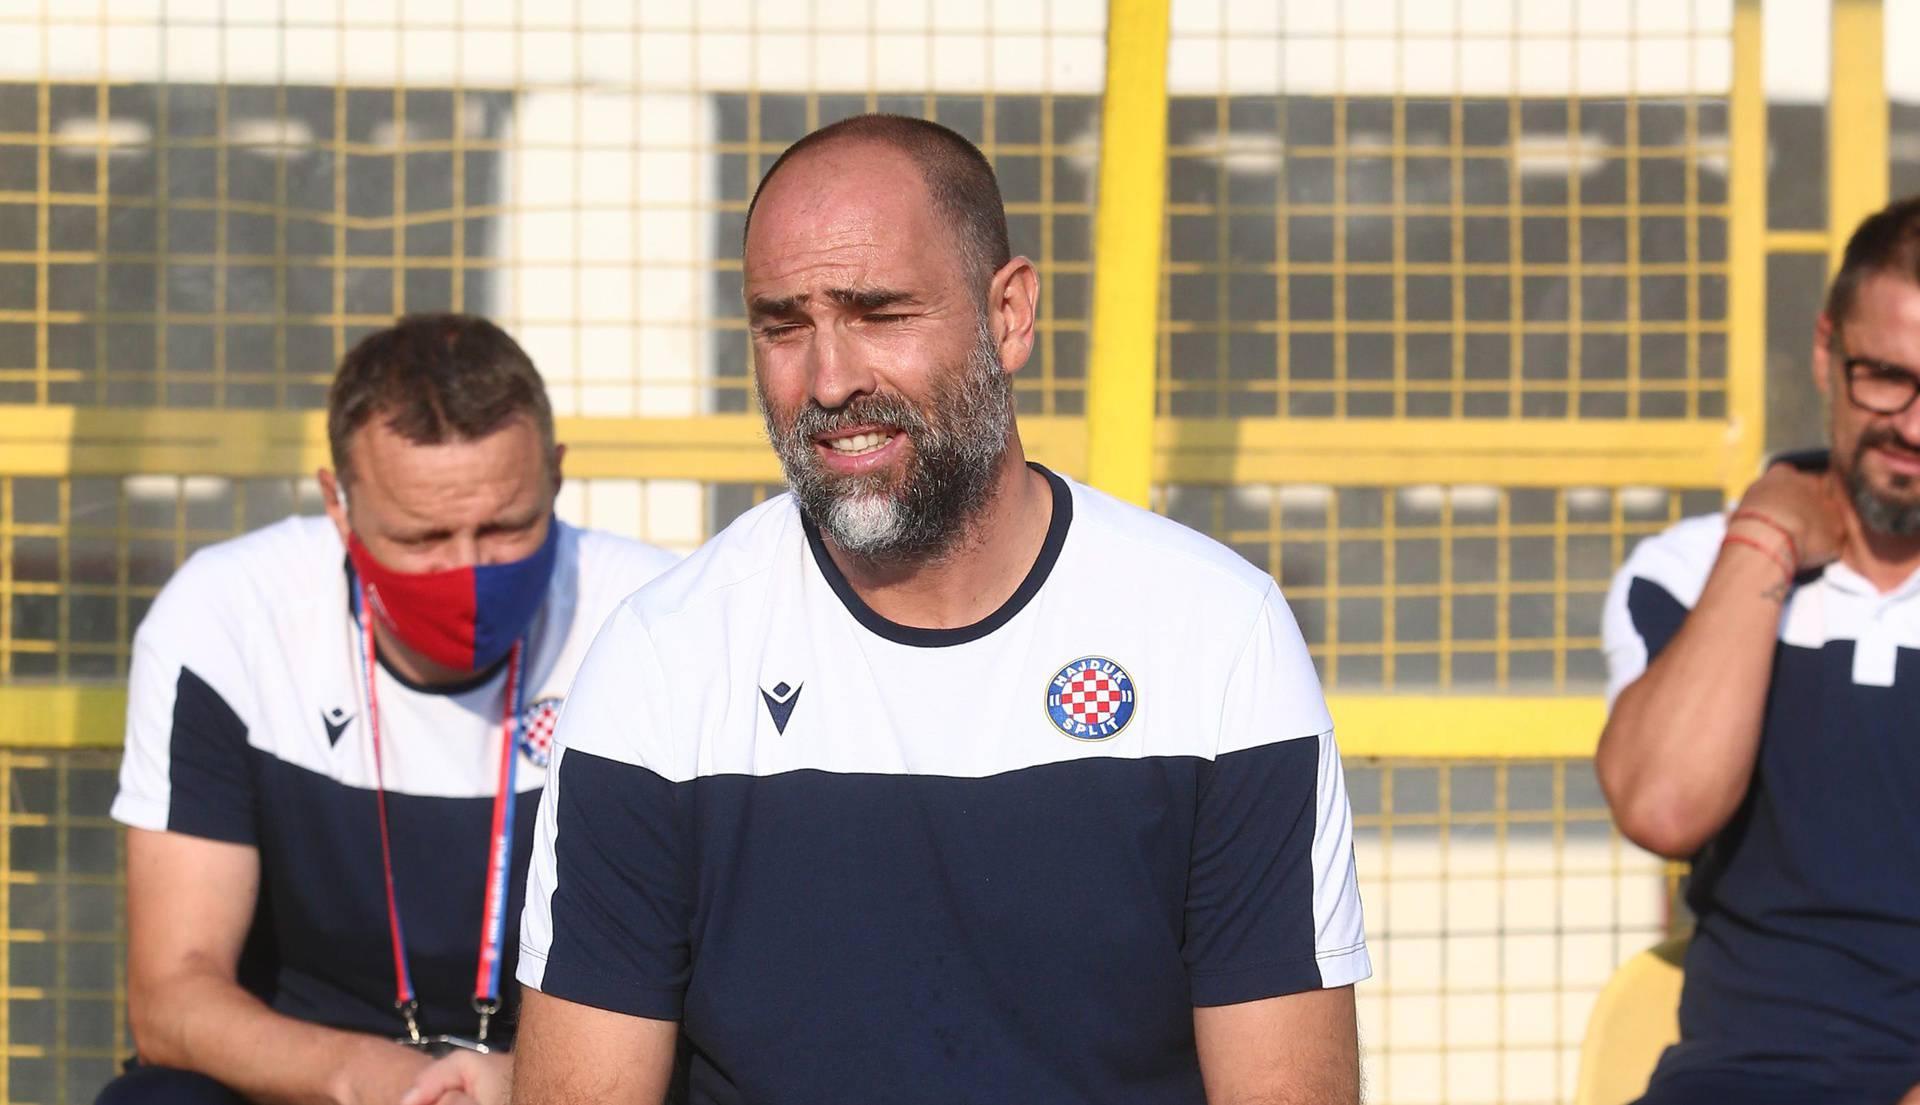 u 36.kolu 1.HNL sastali se Inter i Hajduk